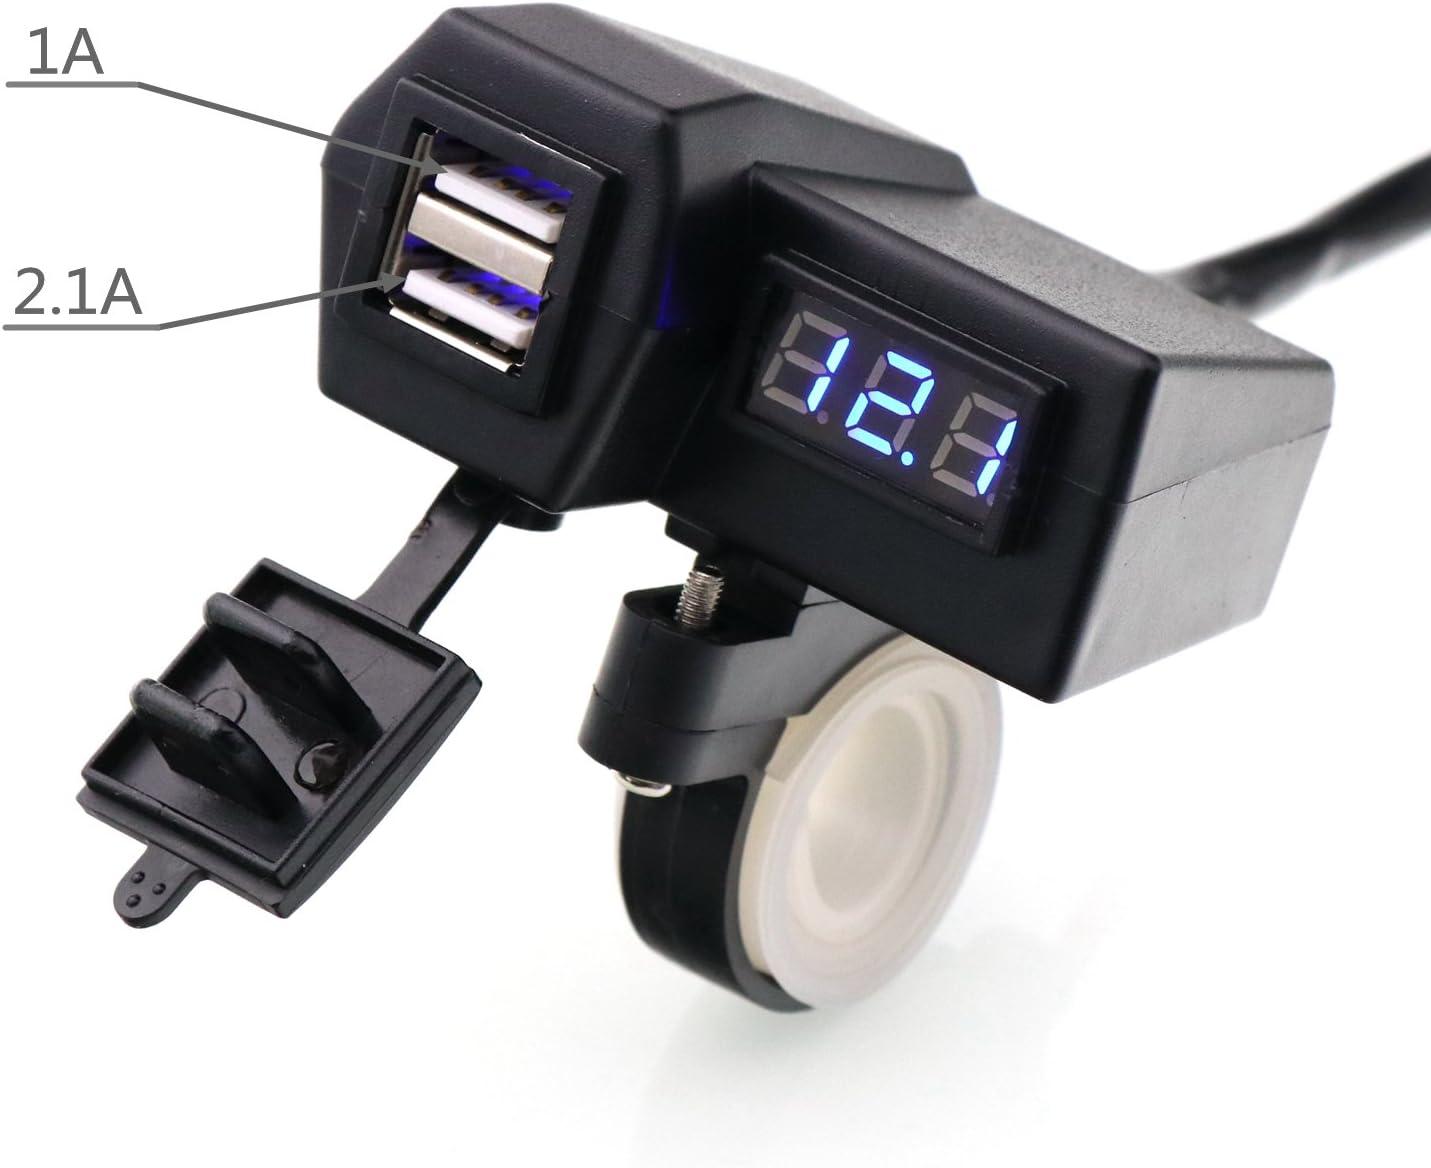 Timloon Cargador de Motocicleta Impermeable 5 V 3,1 A Dual USB y volt/ímetro de Pantalla Azul para Montaje en Manillar DE 7//8 y 1